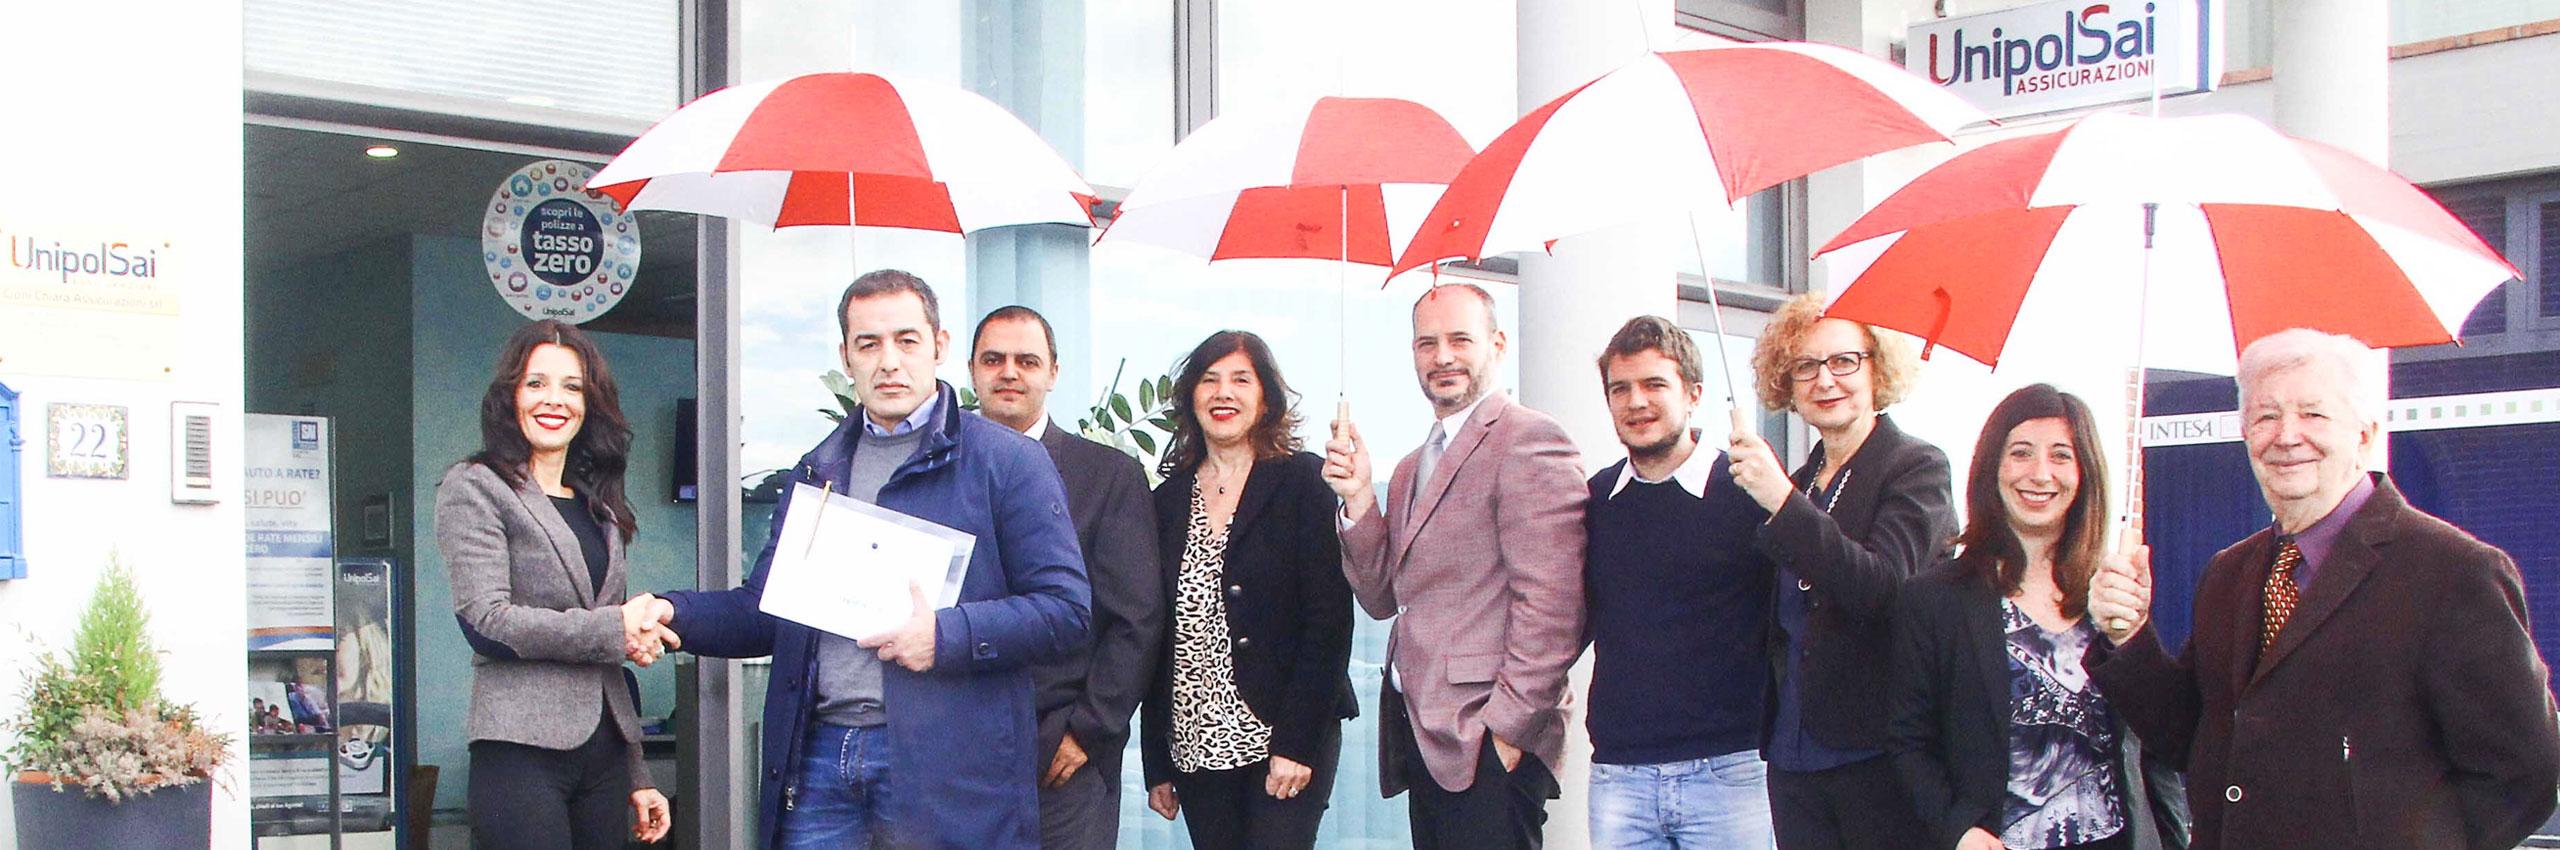 Team Agenzia Assicurazioni